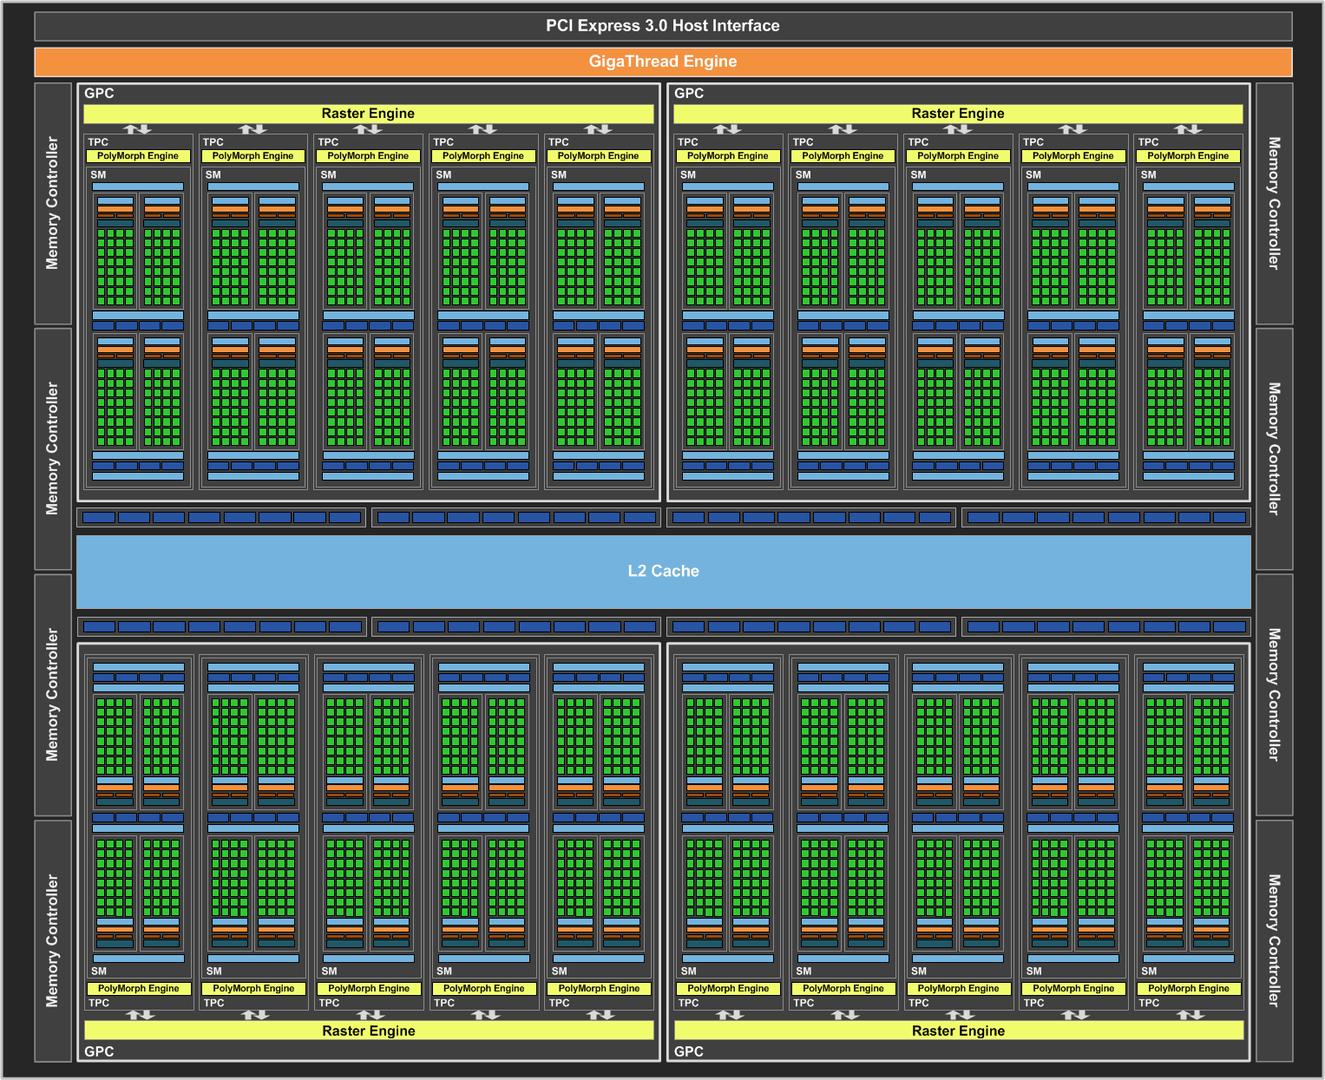 Nvidia GP104 Blockschaltbild